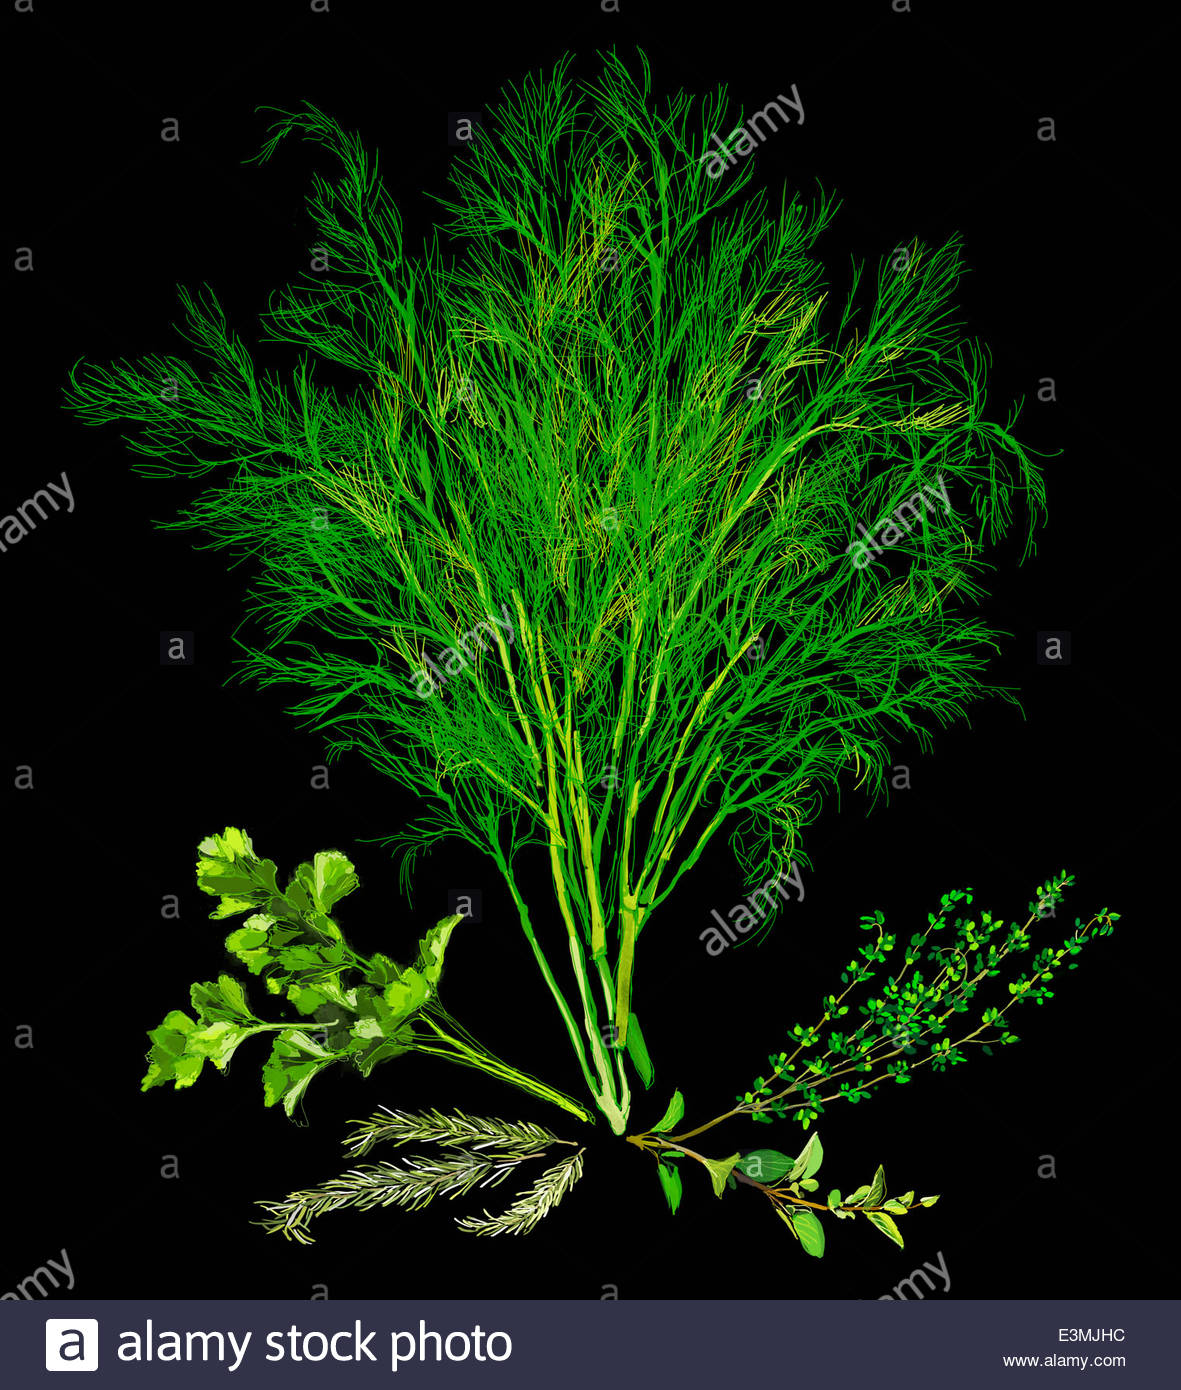 Variety of fresh herbs - Stock Image